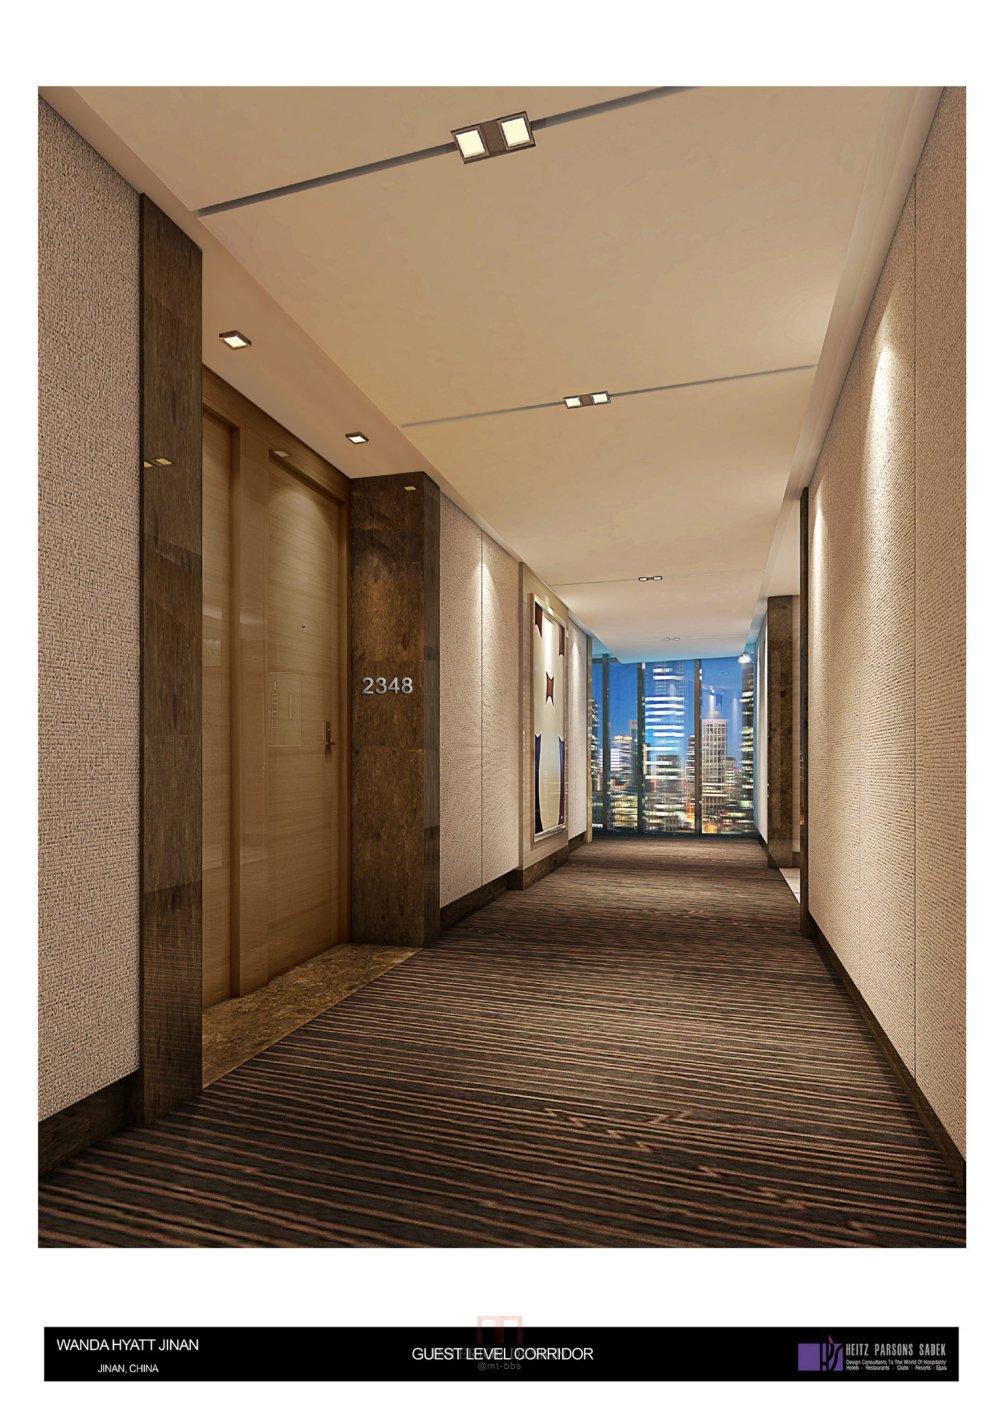 HPS-济南索菲特银座大饭店方案设计(未中标)高清HD图册_客房层走廊.jpg